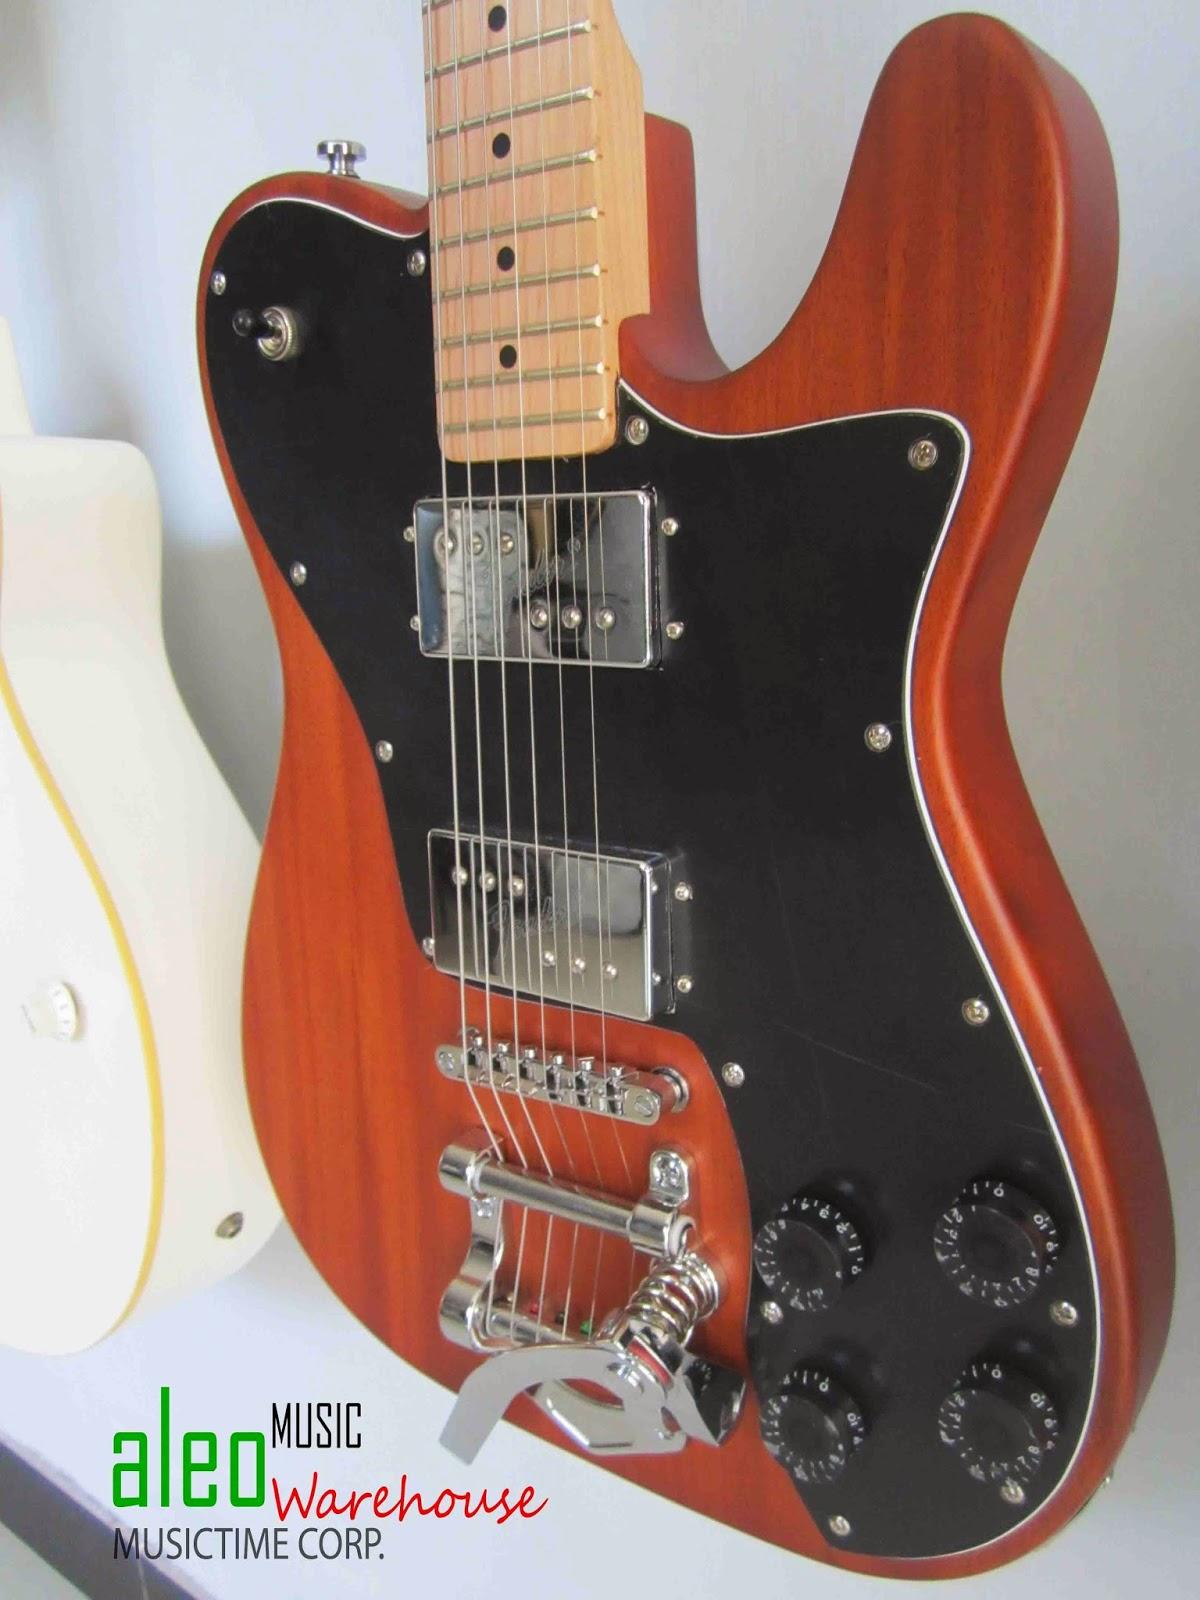 Aleo Music Warehouse Fender Telecaster Mahogany With Bigsby